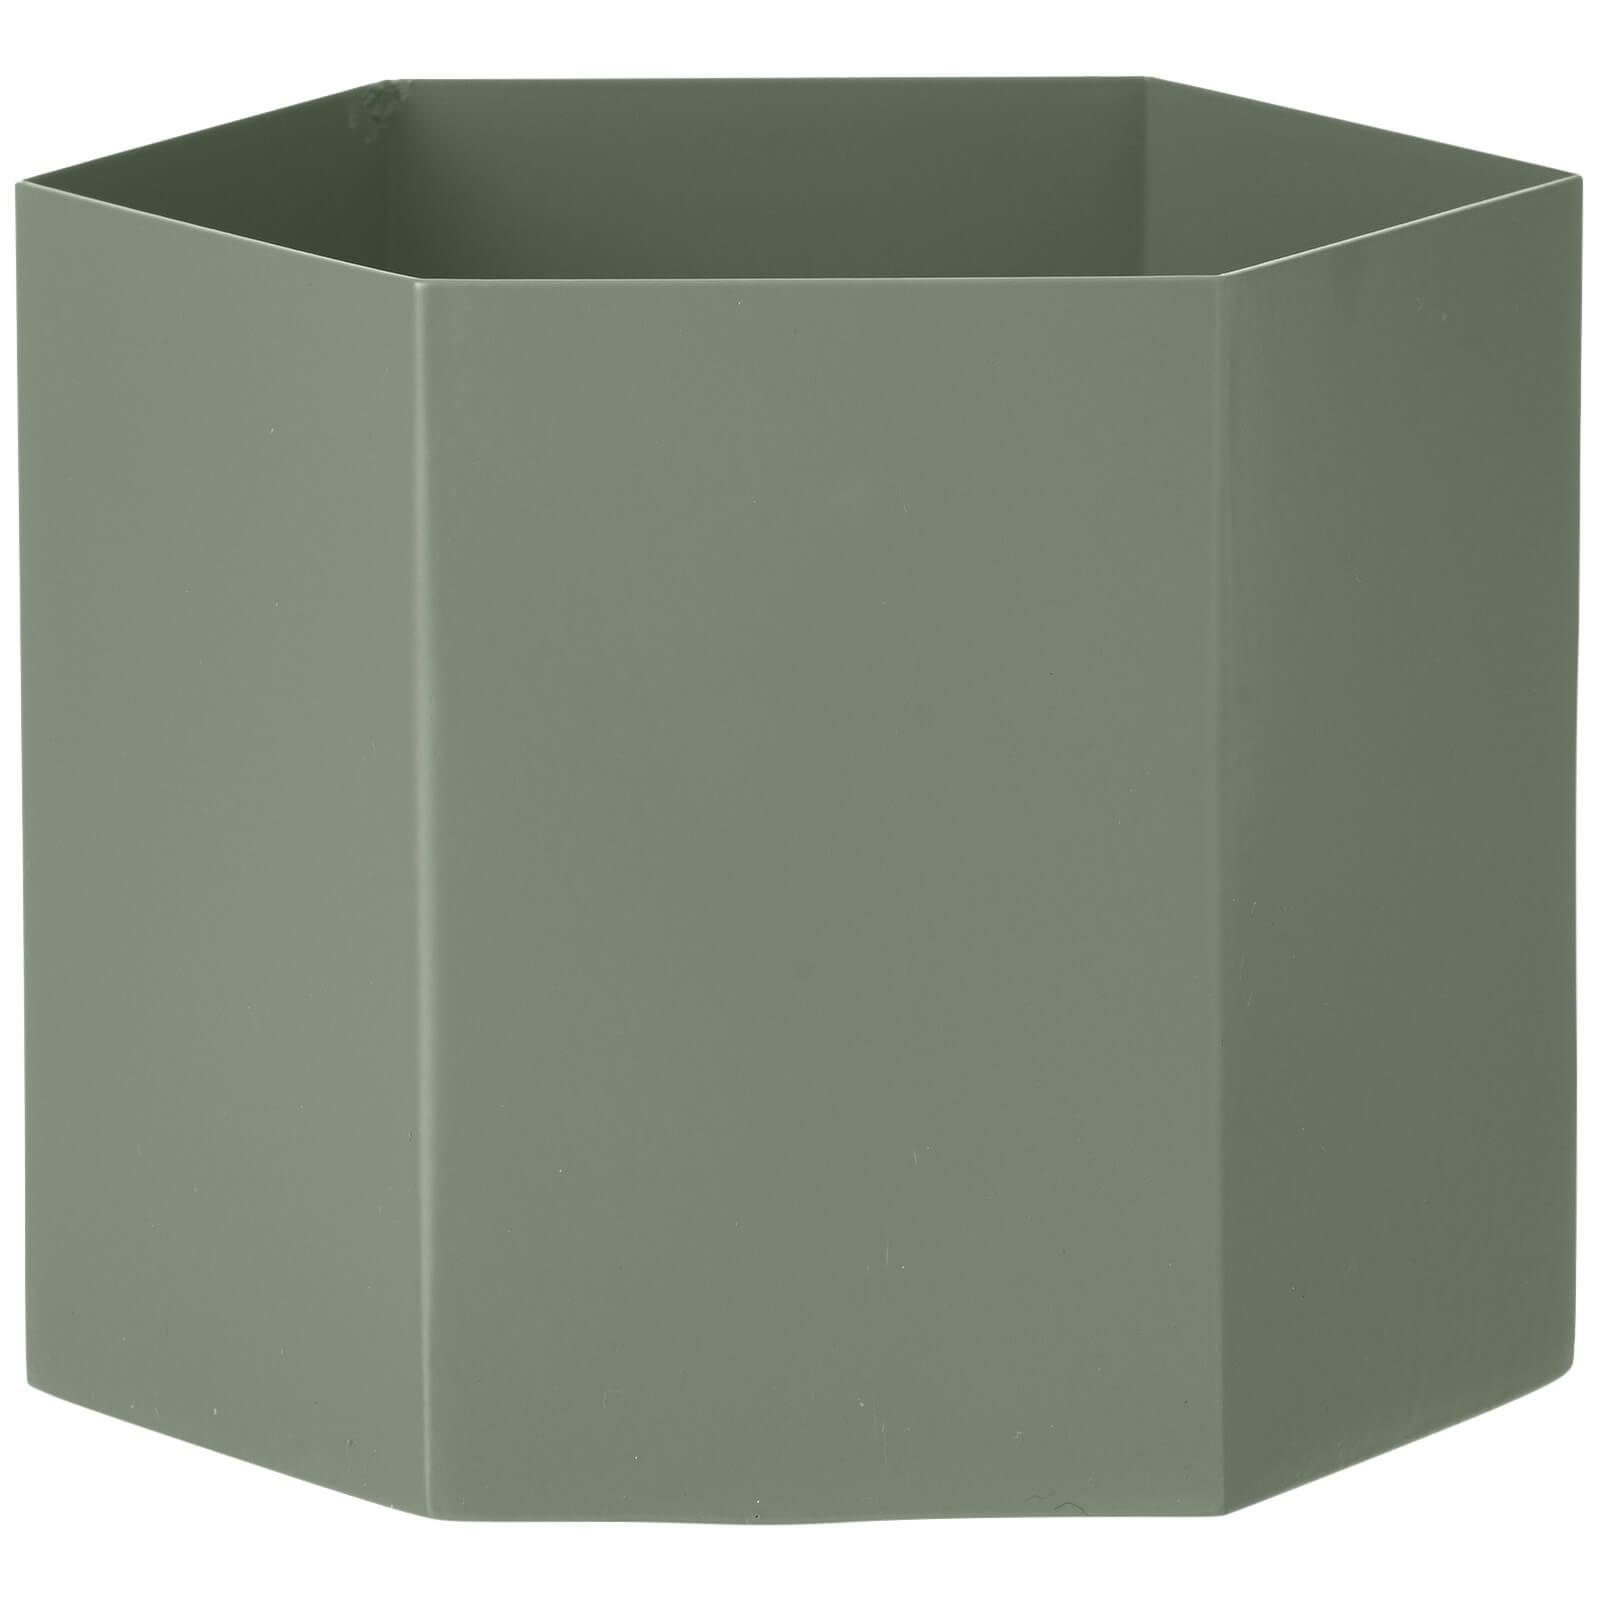 Ferm Living Hexagon Pot - Extra Large - Dusty Green